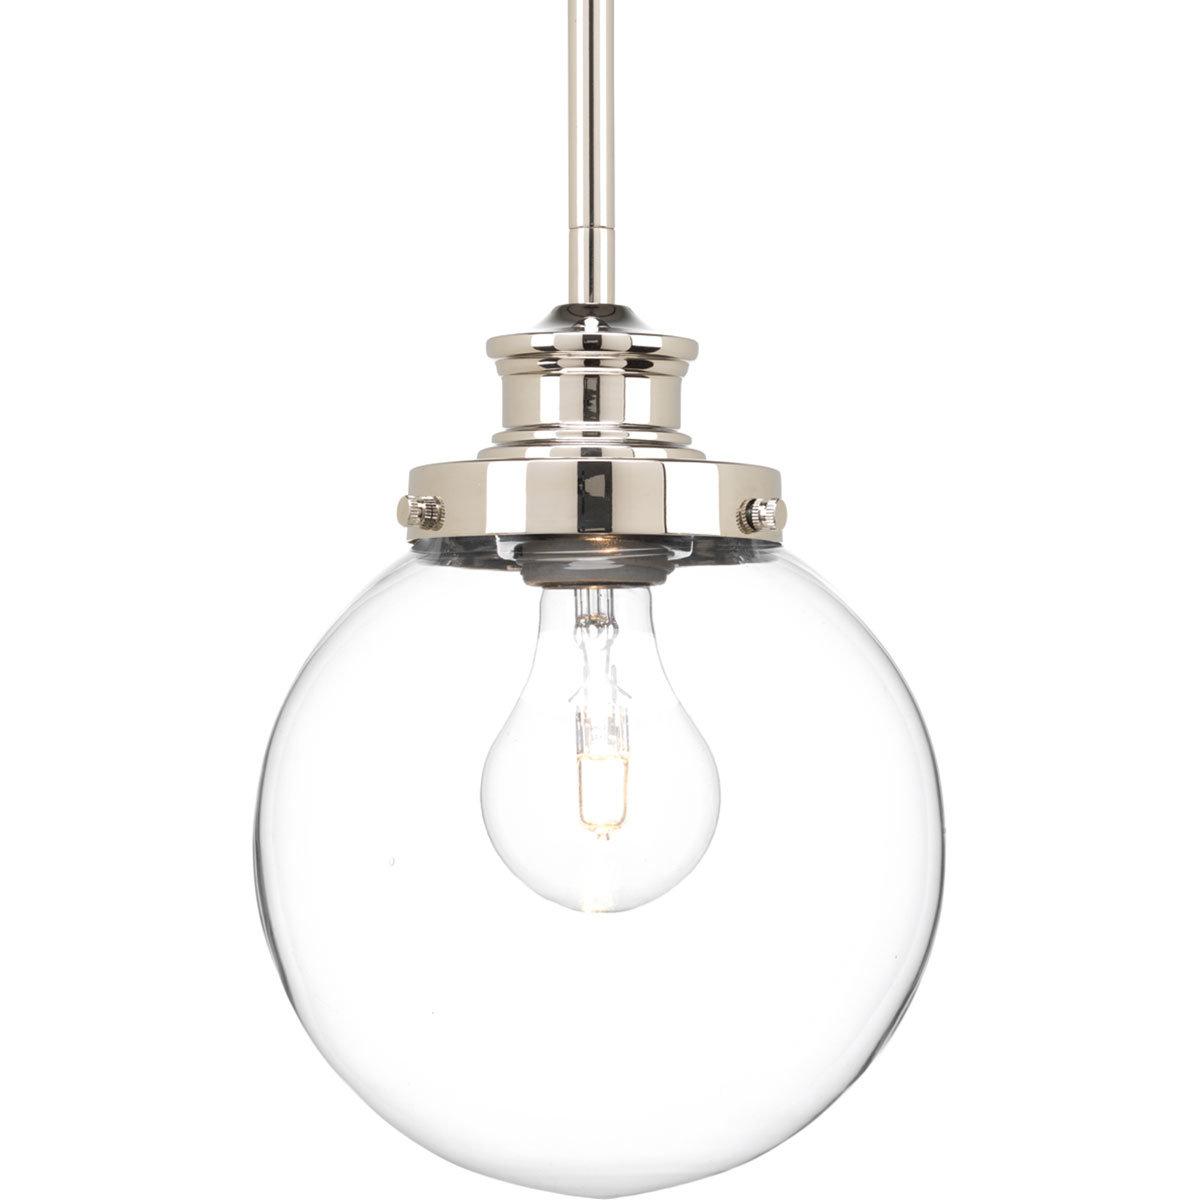 Popular Irwin 1 Light Single Globe Pendants Throughout Zipcode Design Cayden 1 Light Single Globe Pendant (Gallery 9 of 20)